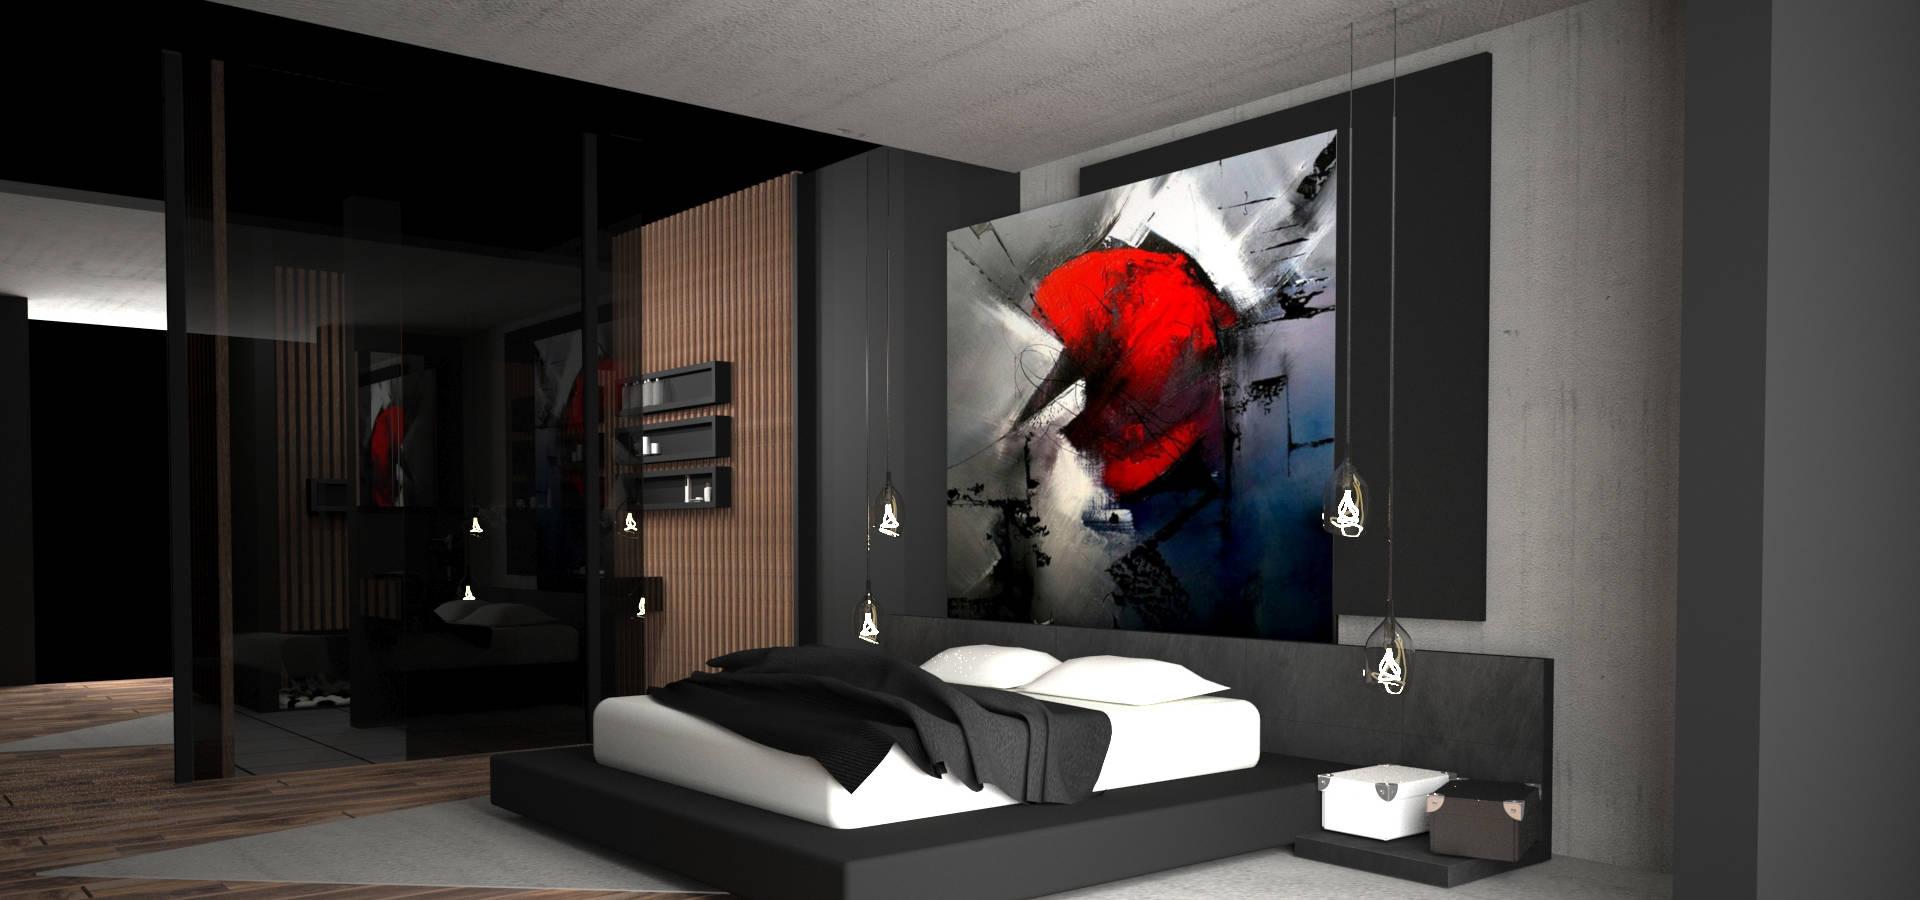 Nix Design Studio